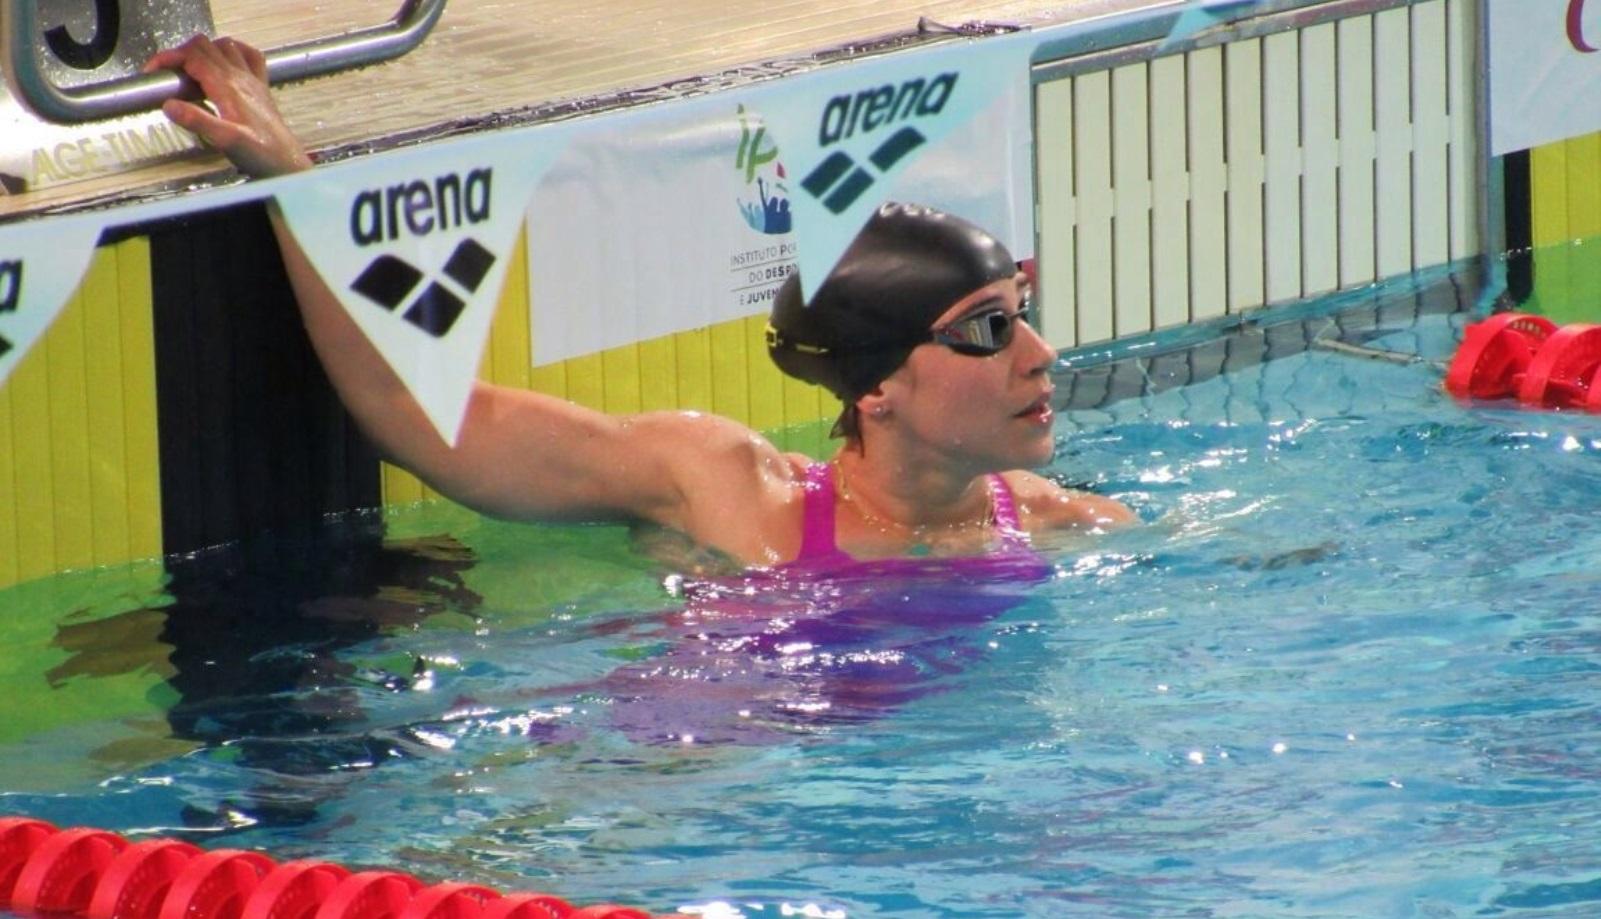 Swimmer Inbal Pezaro has a good chance of medaling in Rio. Photo by Karen Leibivitz Swet